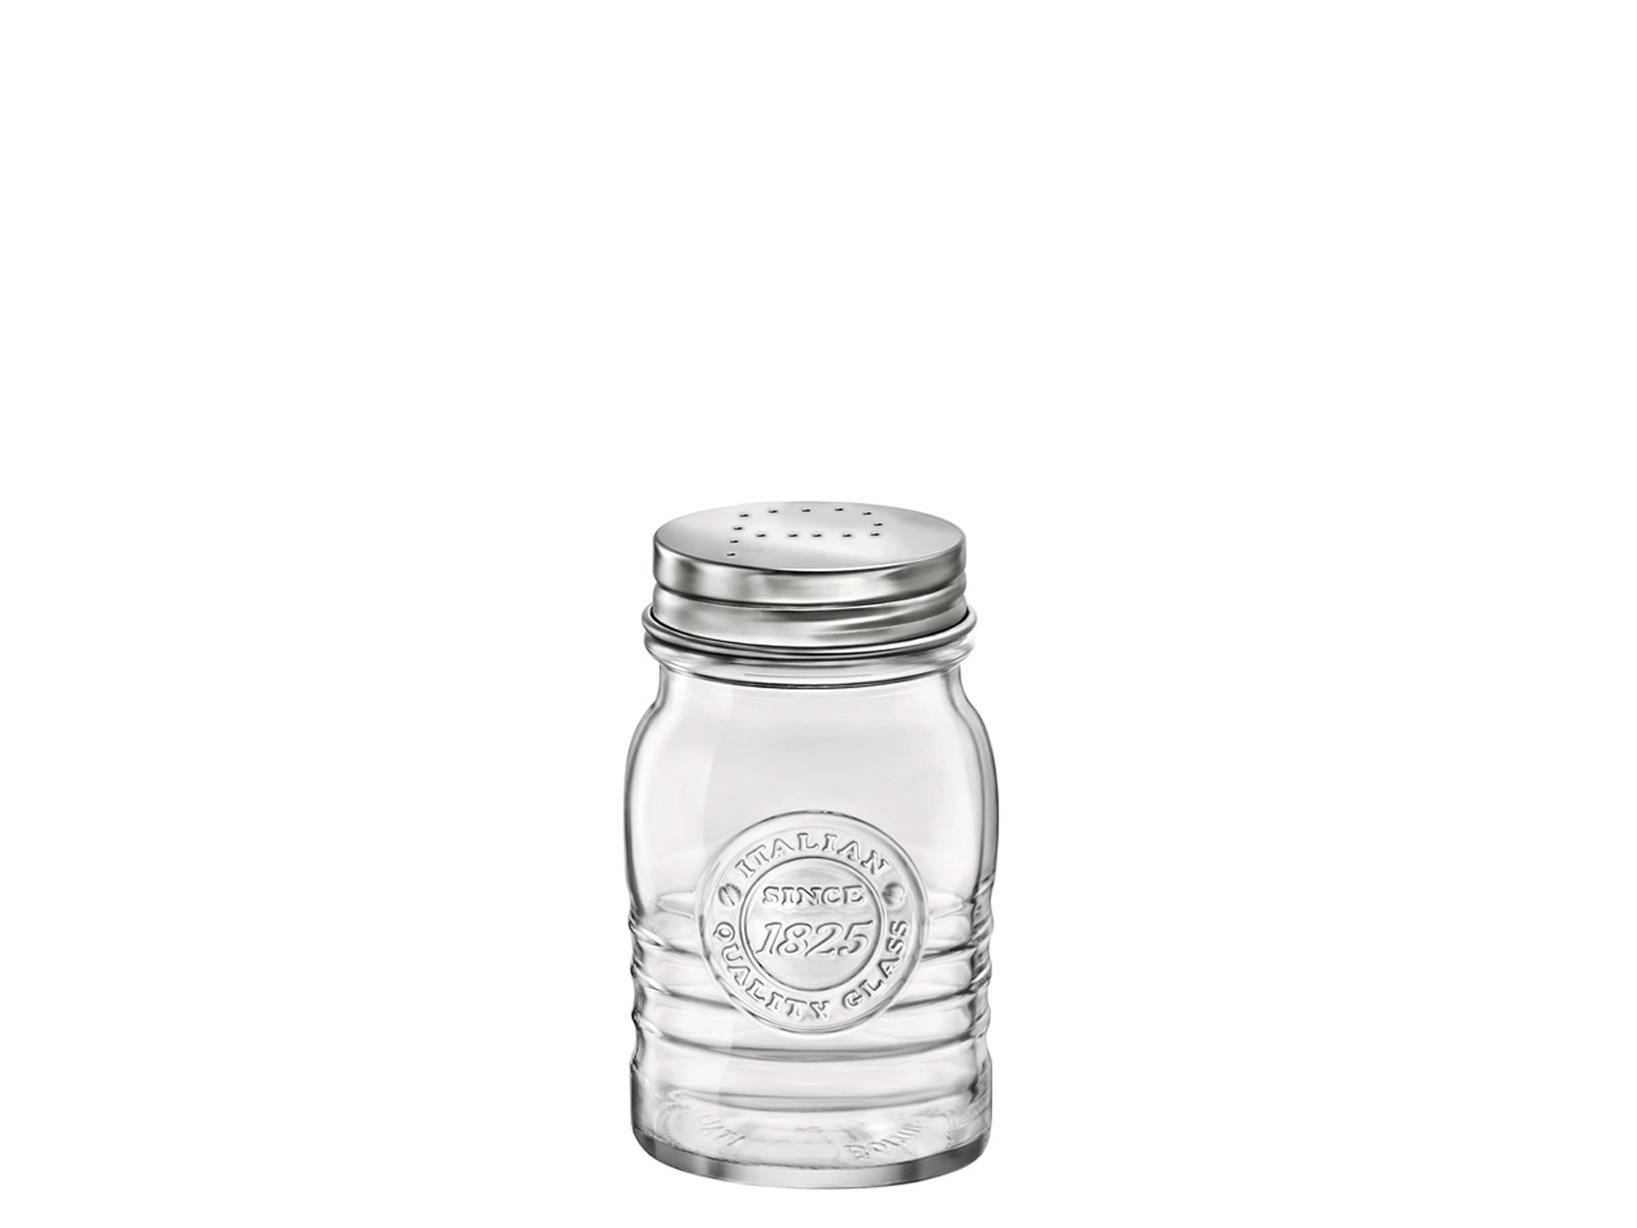 Spargipepe In Vetro Officina1825 T/inox